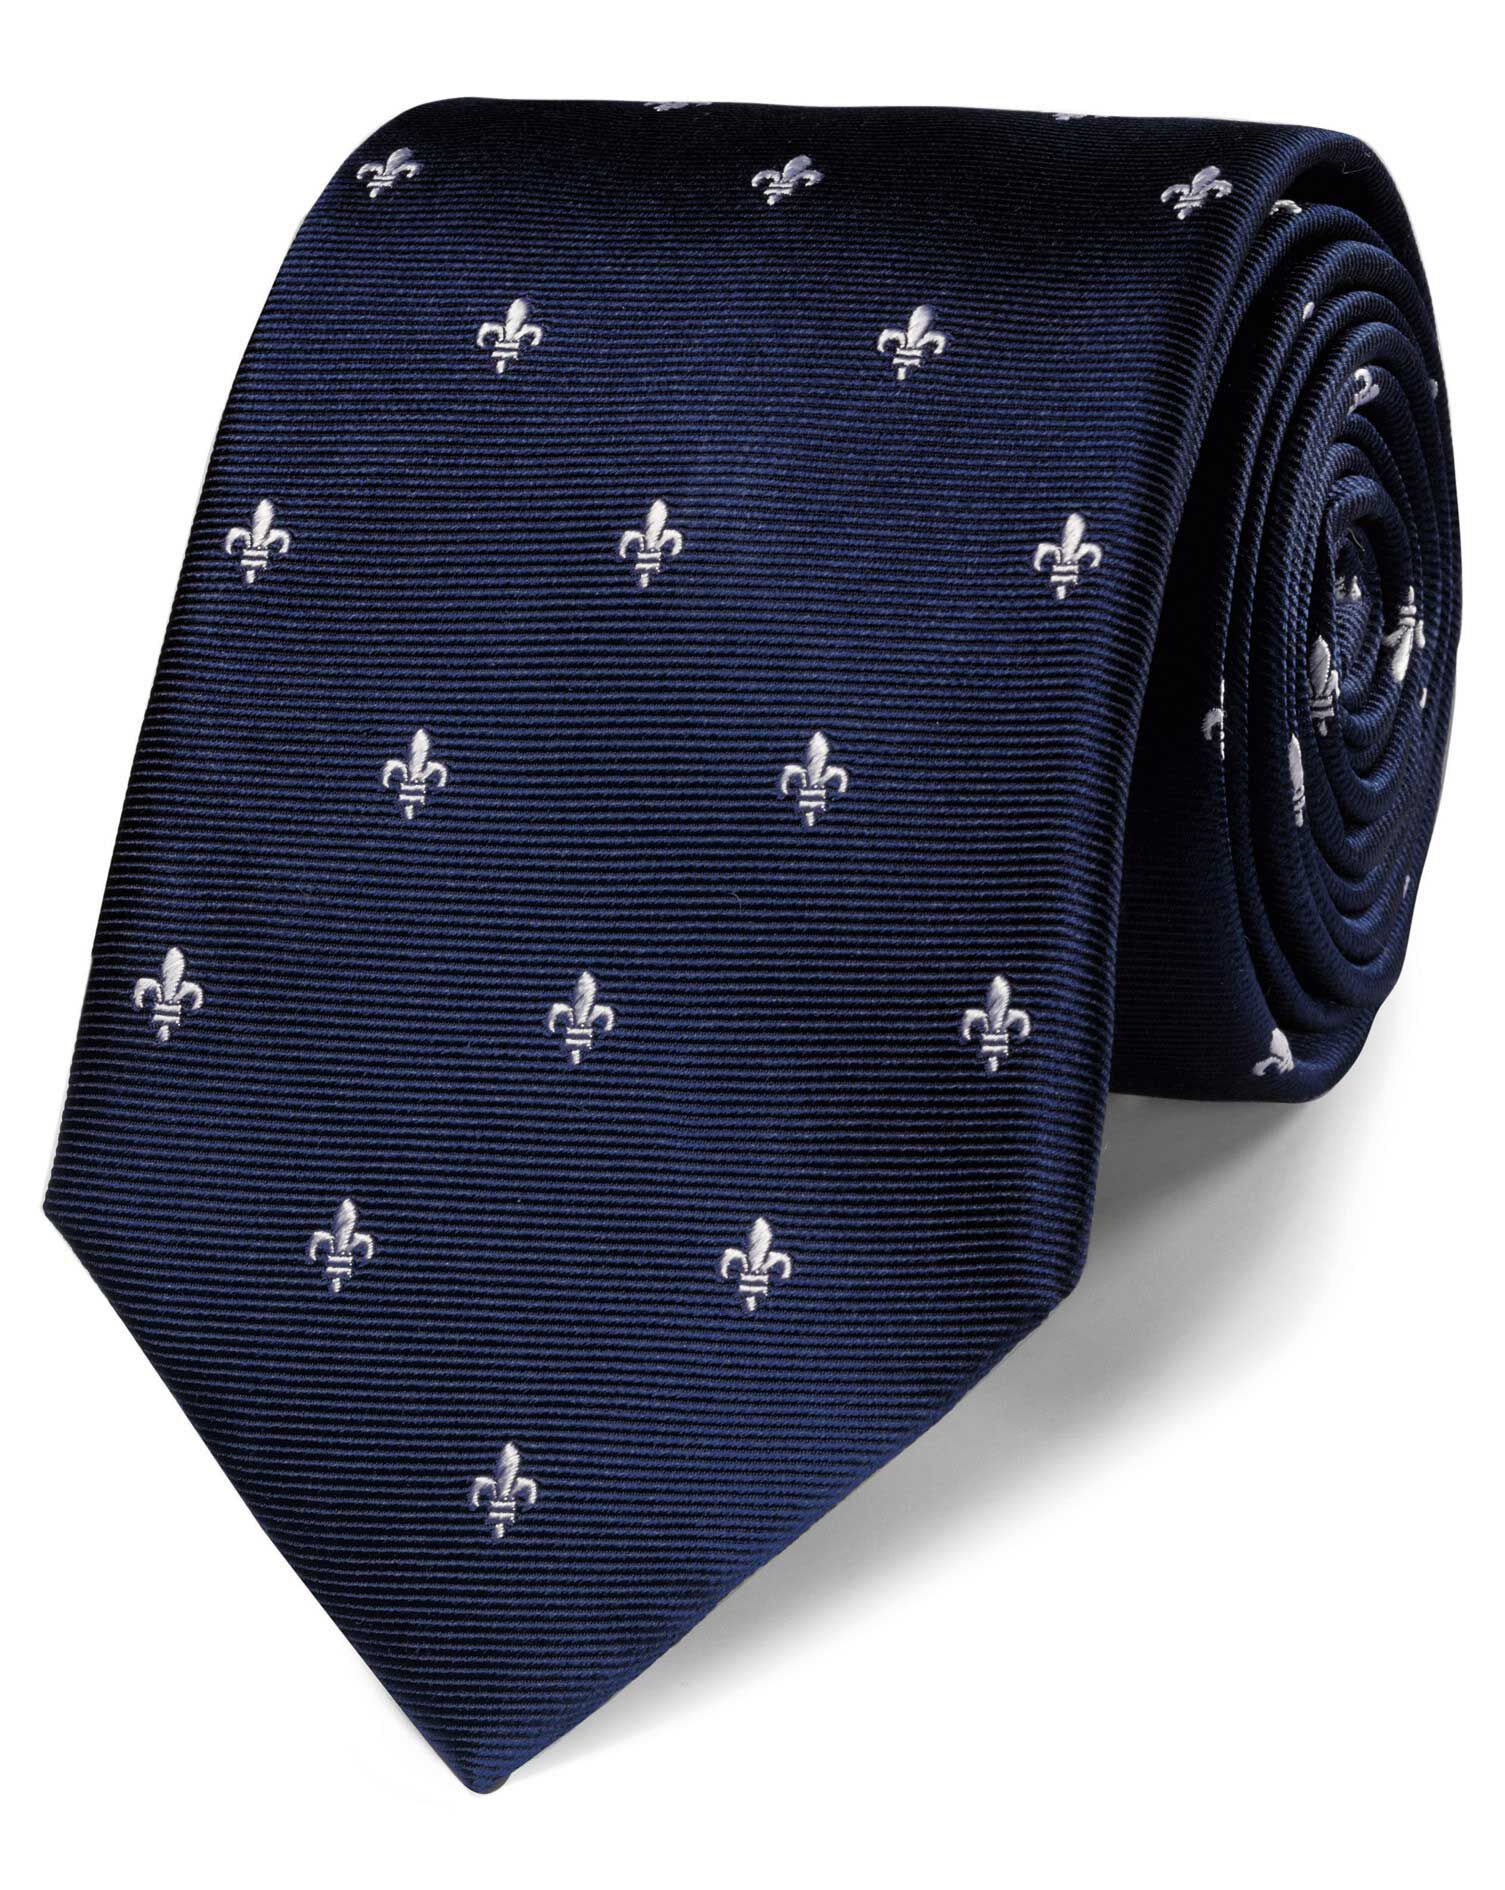 Navy Silk Fleur-De-Lys Classic Tie Size OSFA by Charles Tyrwhitt